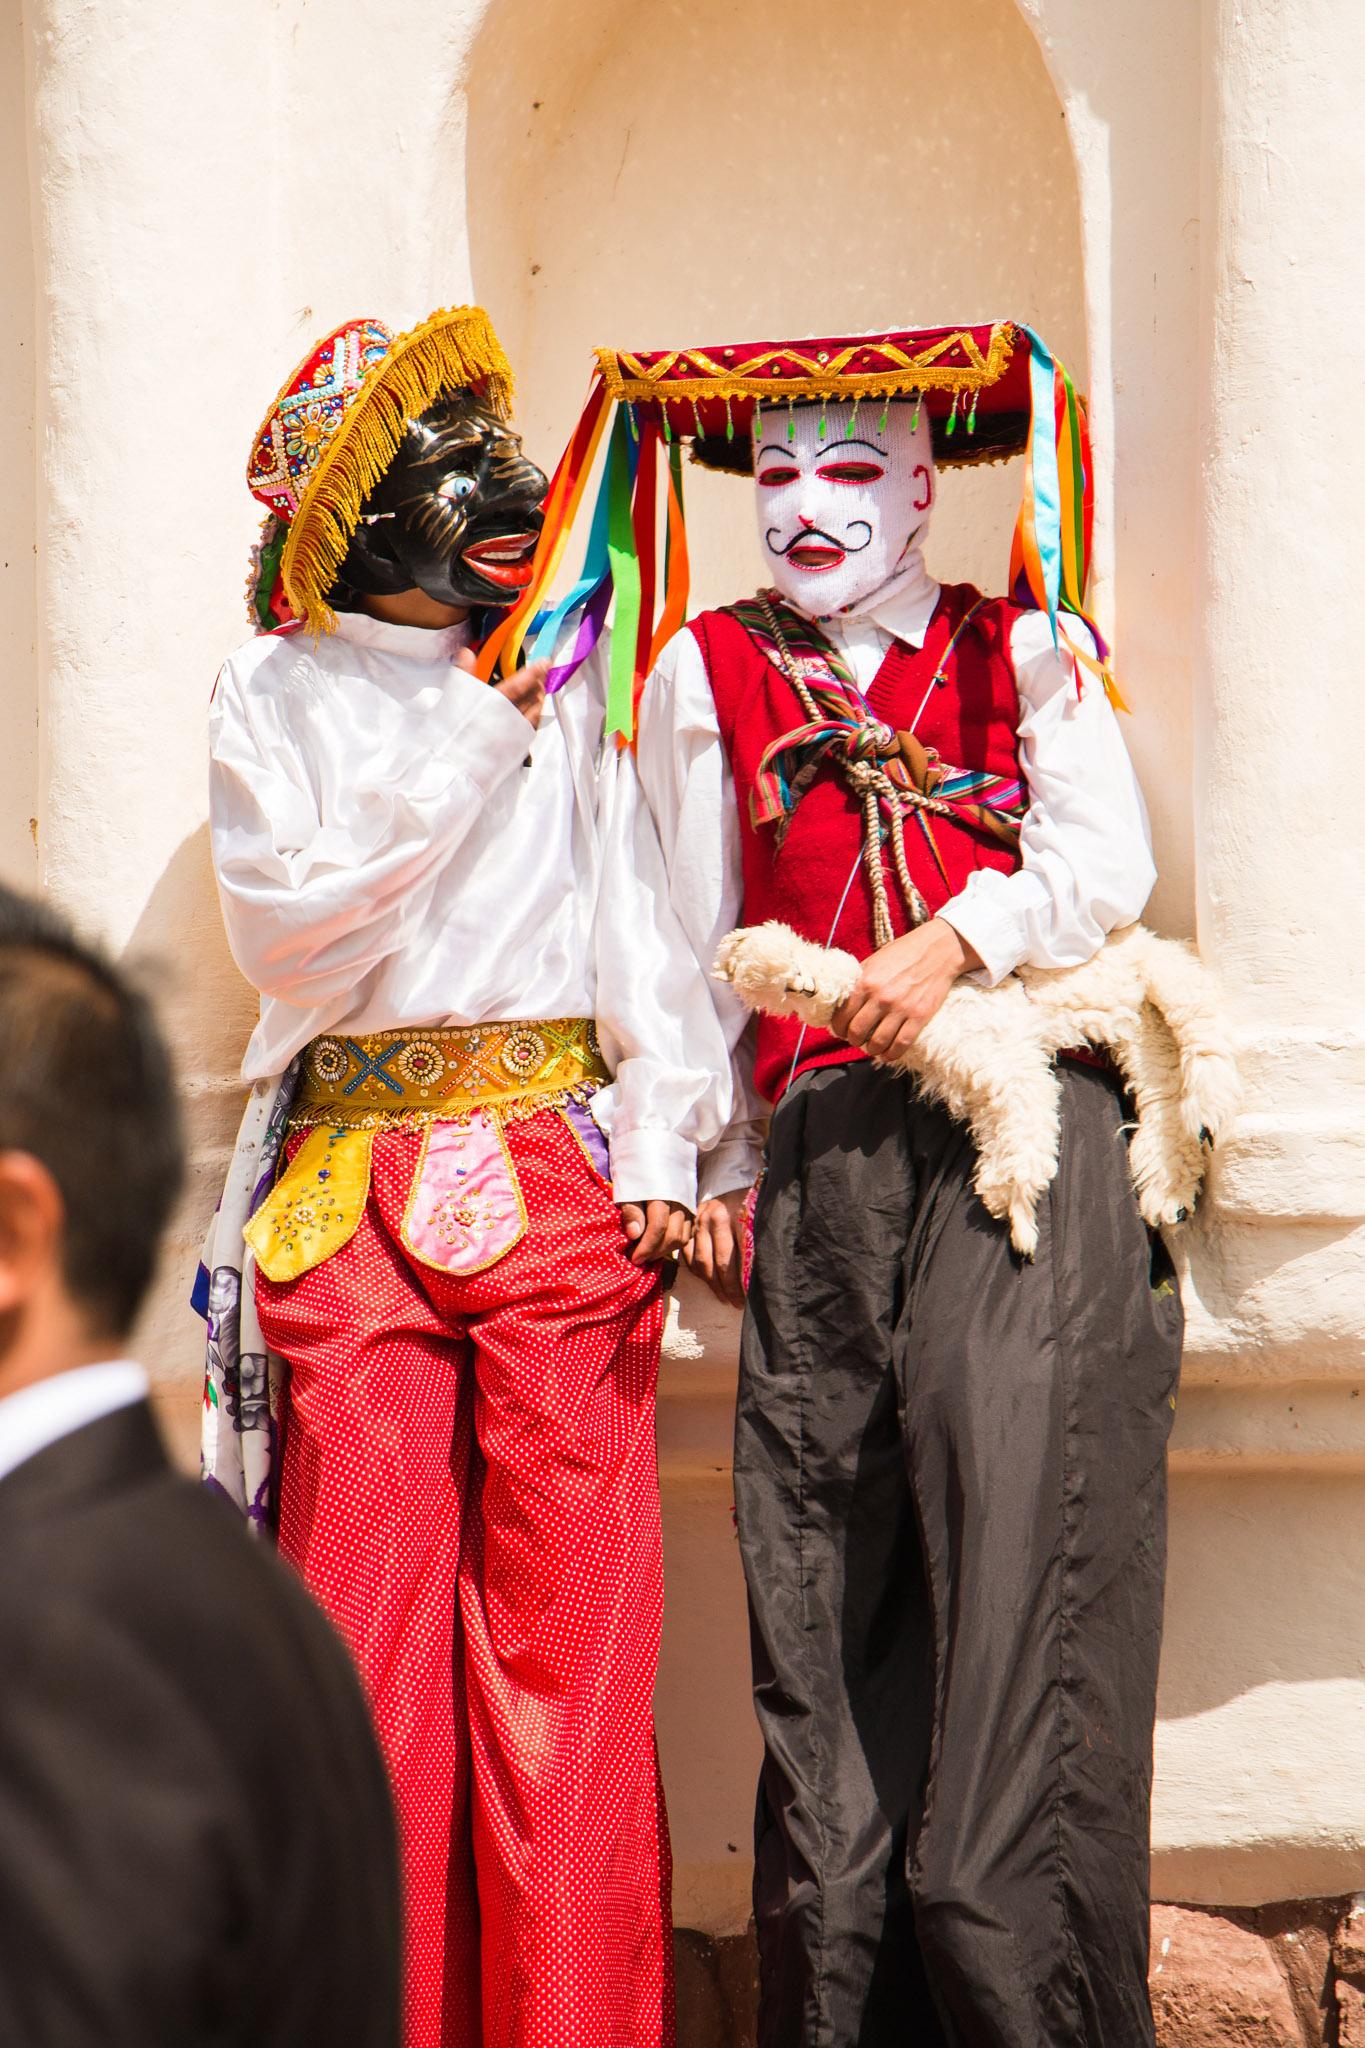 Wedding-Travellers-Destination-Wedding-Peru-Cusco-Hacienda-Sarapampa-Sacred-Valley-traditional-costumes